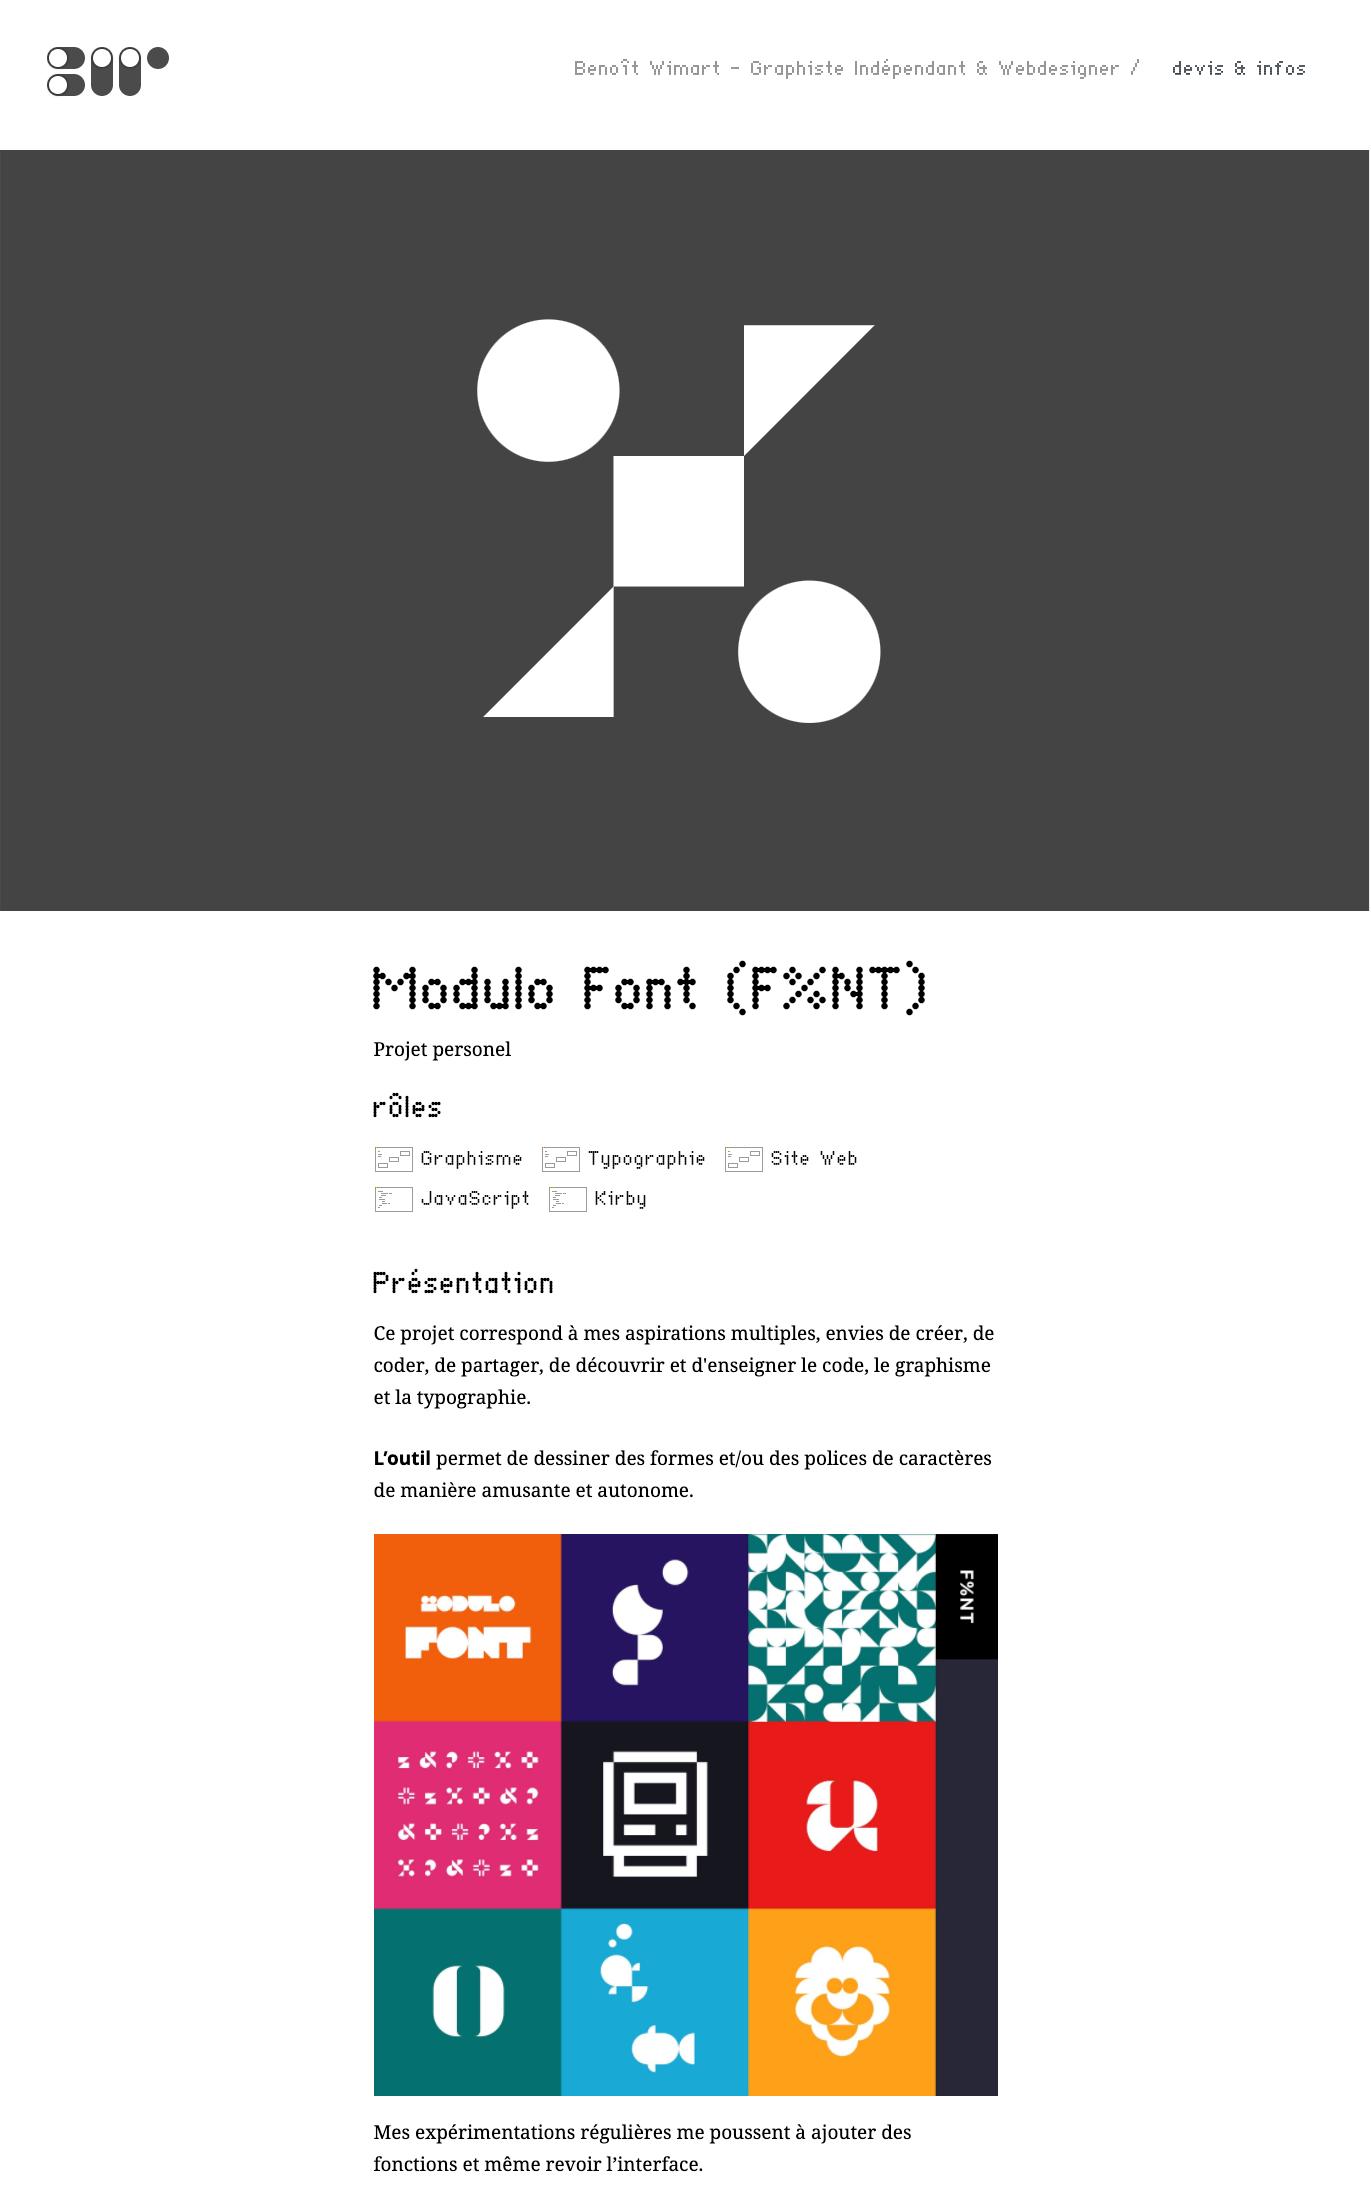 site web modulo font © benoit wimart